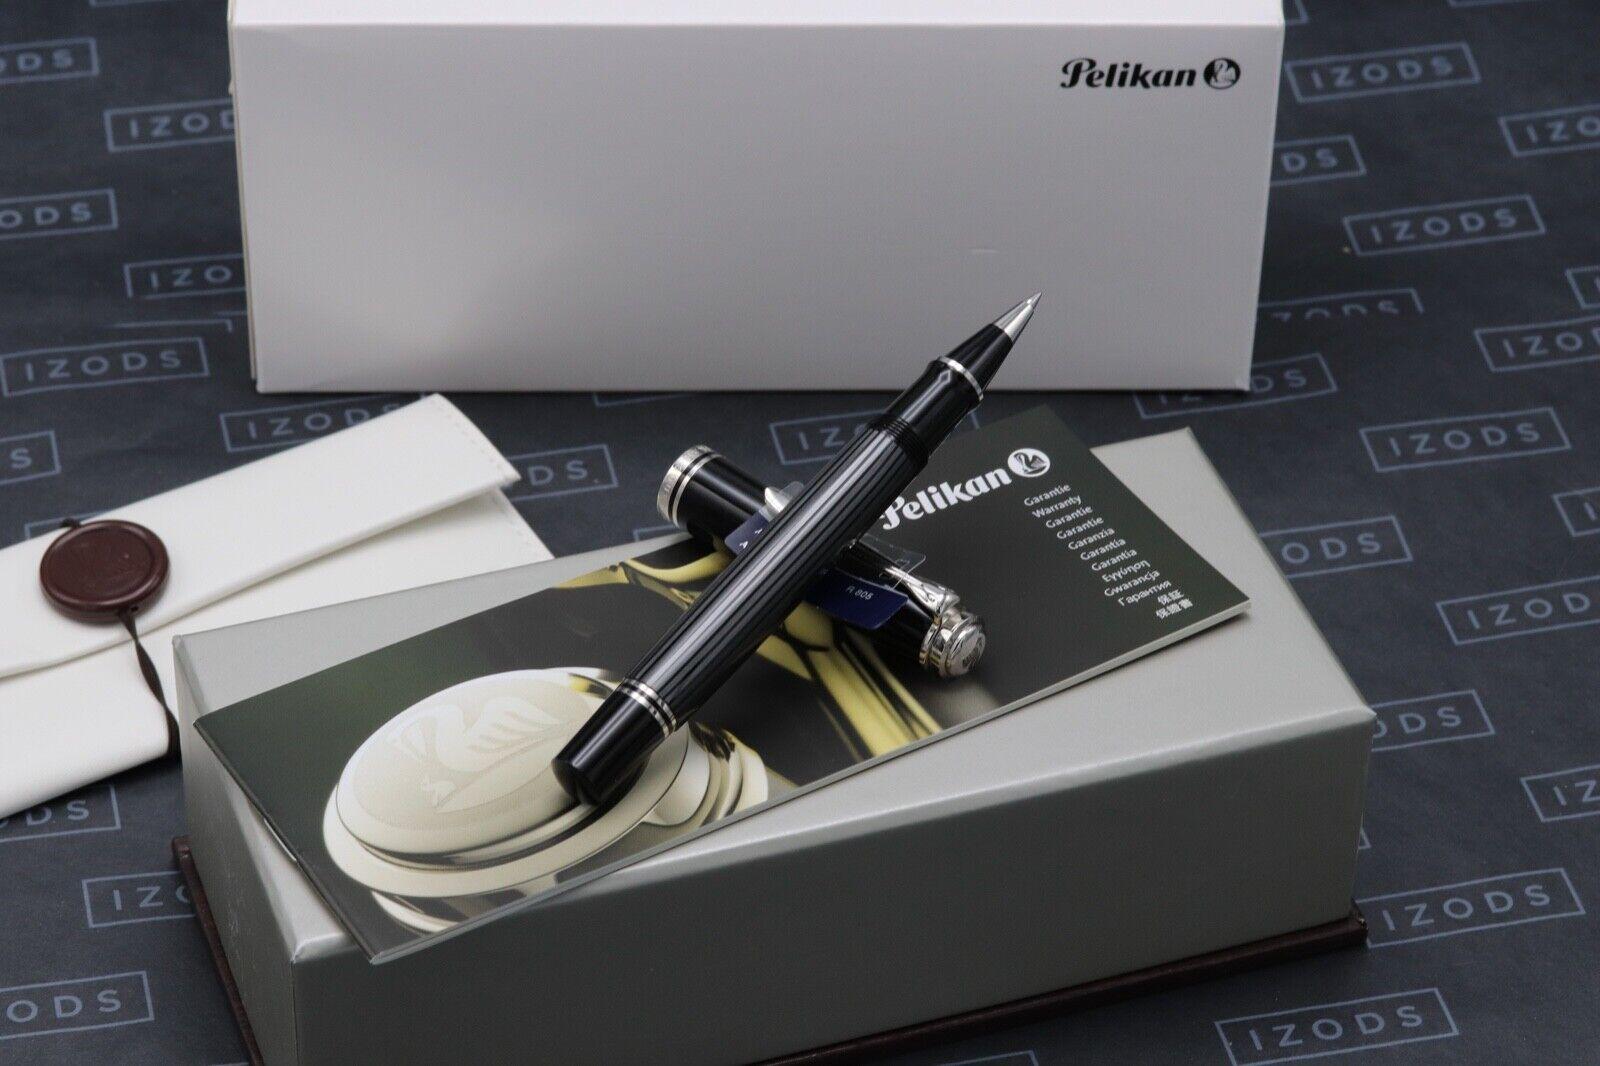 Pelikan Souveran R805 Stresemann Rollerball Pen